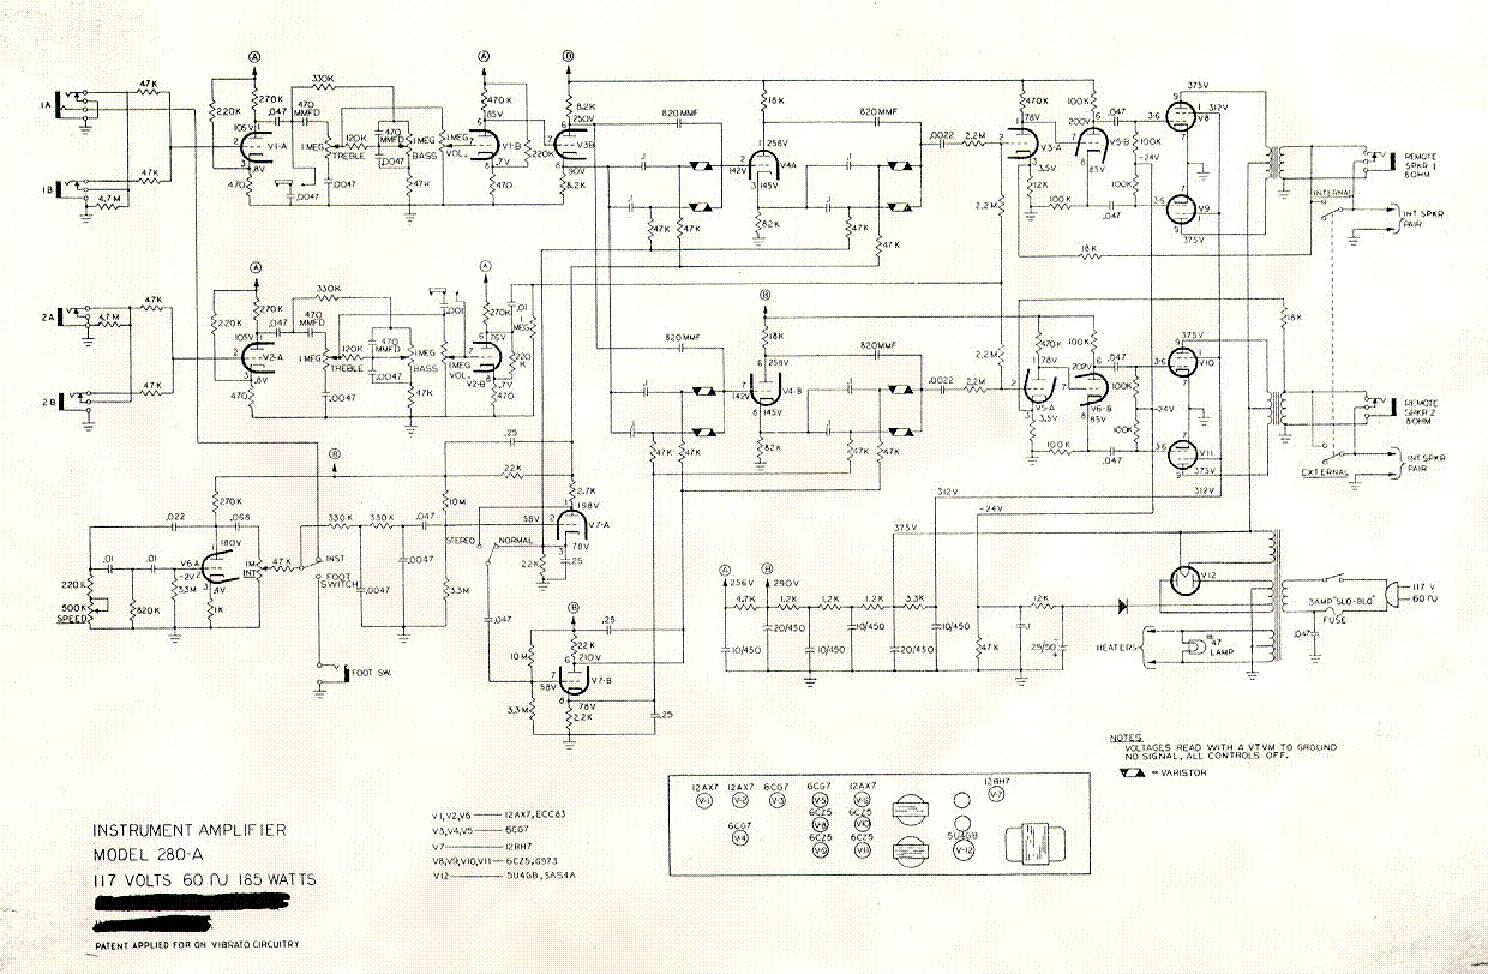 Magnatone 280-A   Schematics   Diagram, Floor plans on